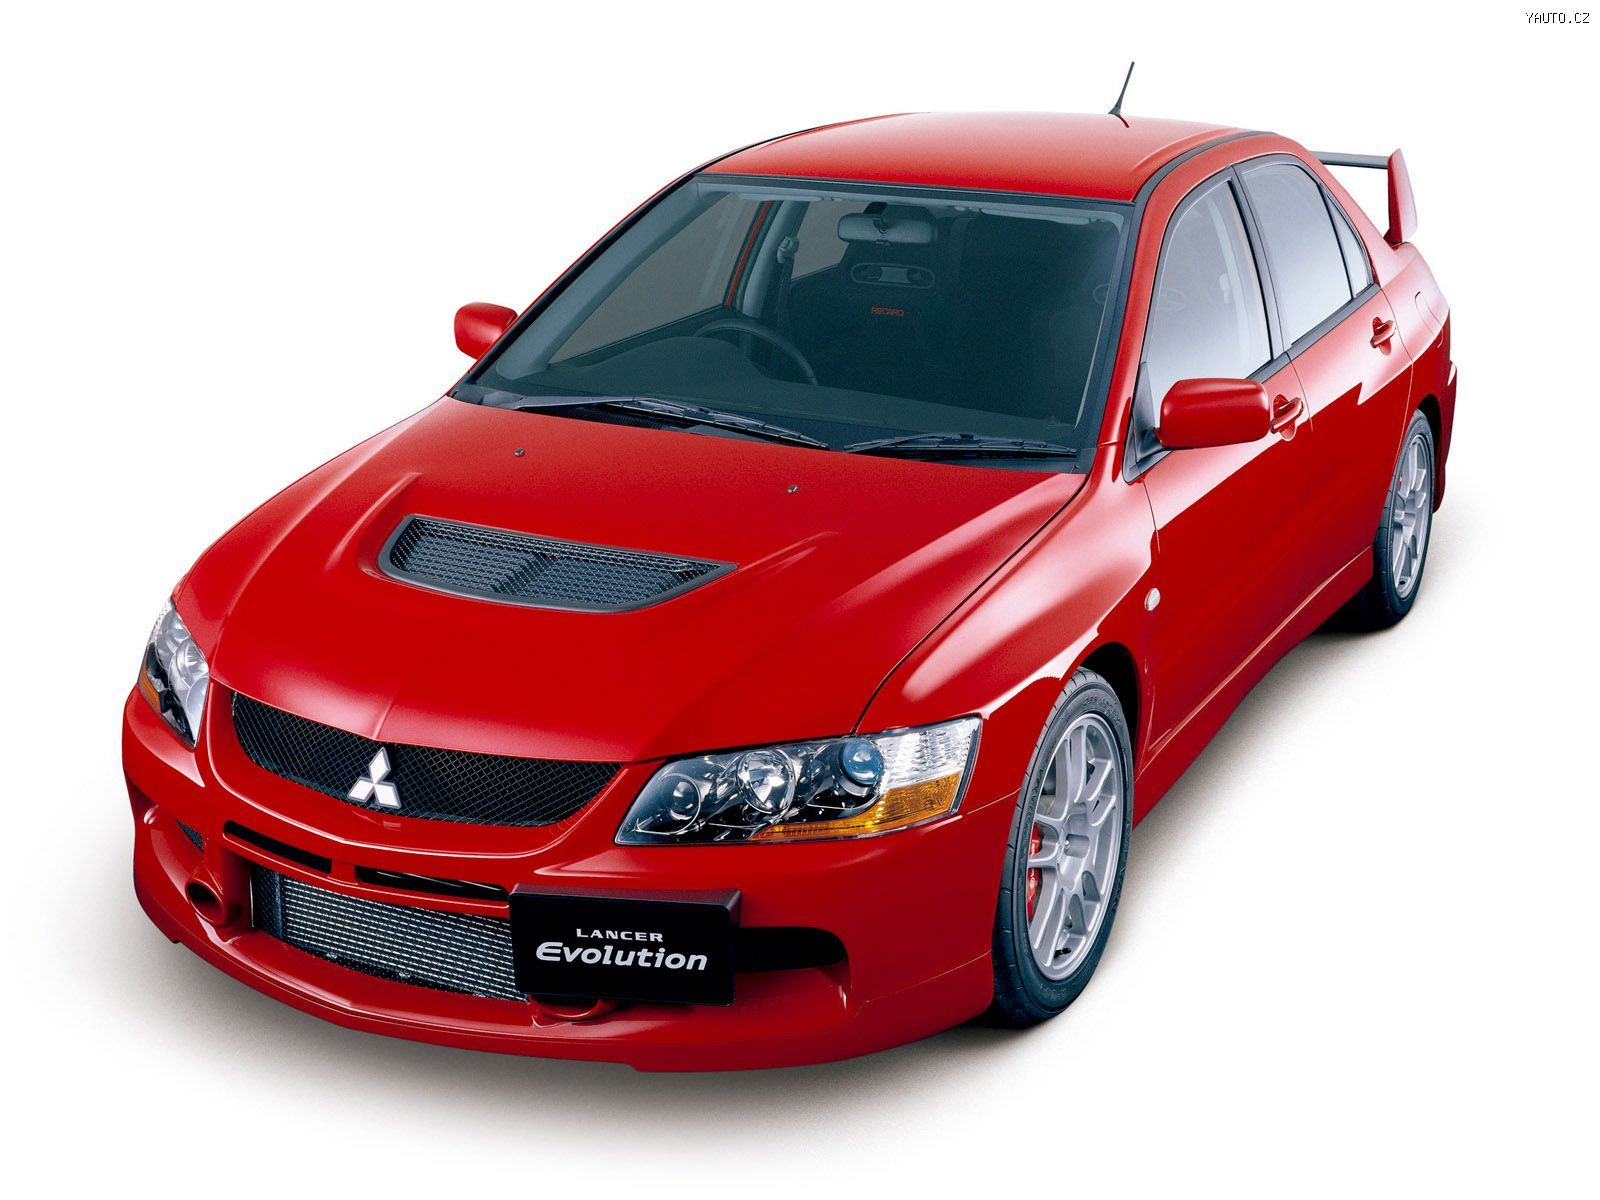 Mitsubishi Lancer Evolution Ix Mitsubishi Lancer Evolution Mitsubishi Lancer Mitsubishi Cars